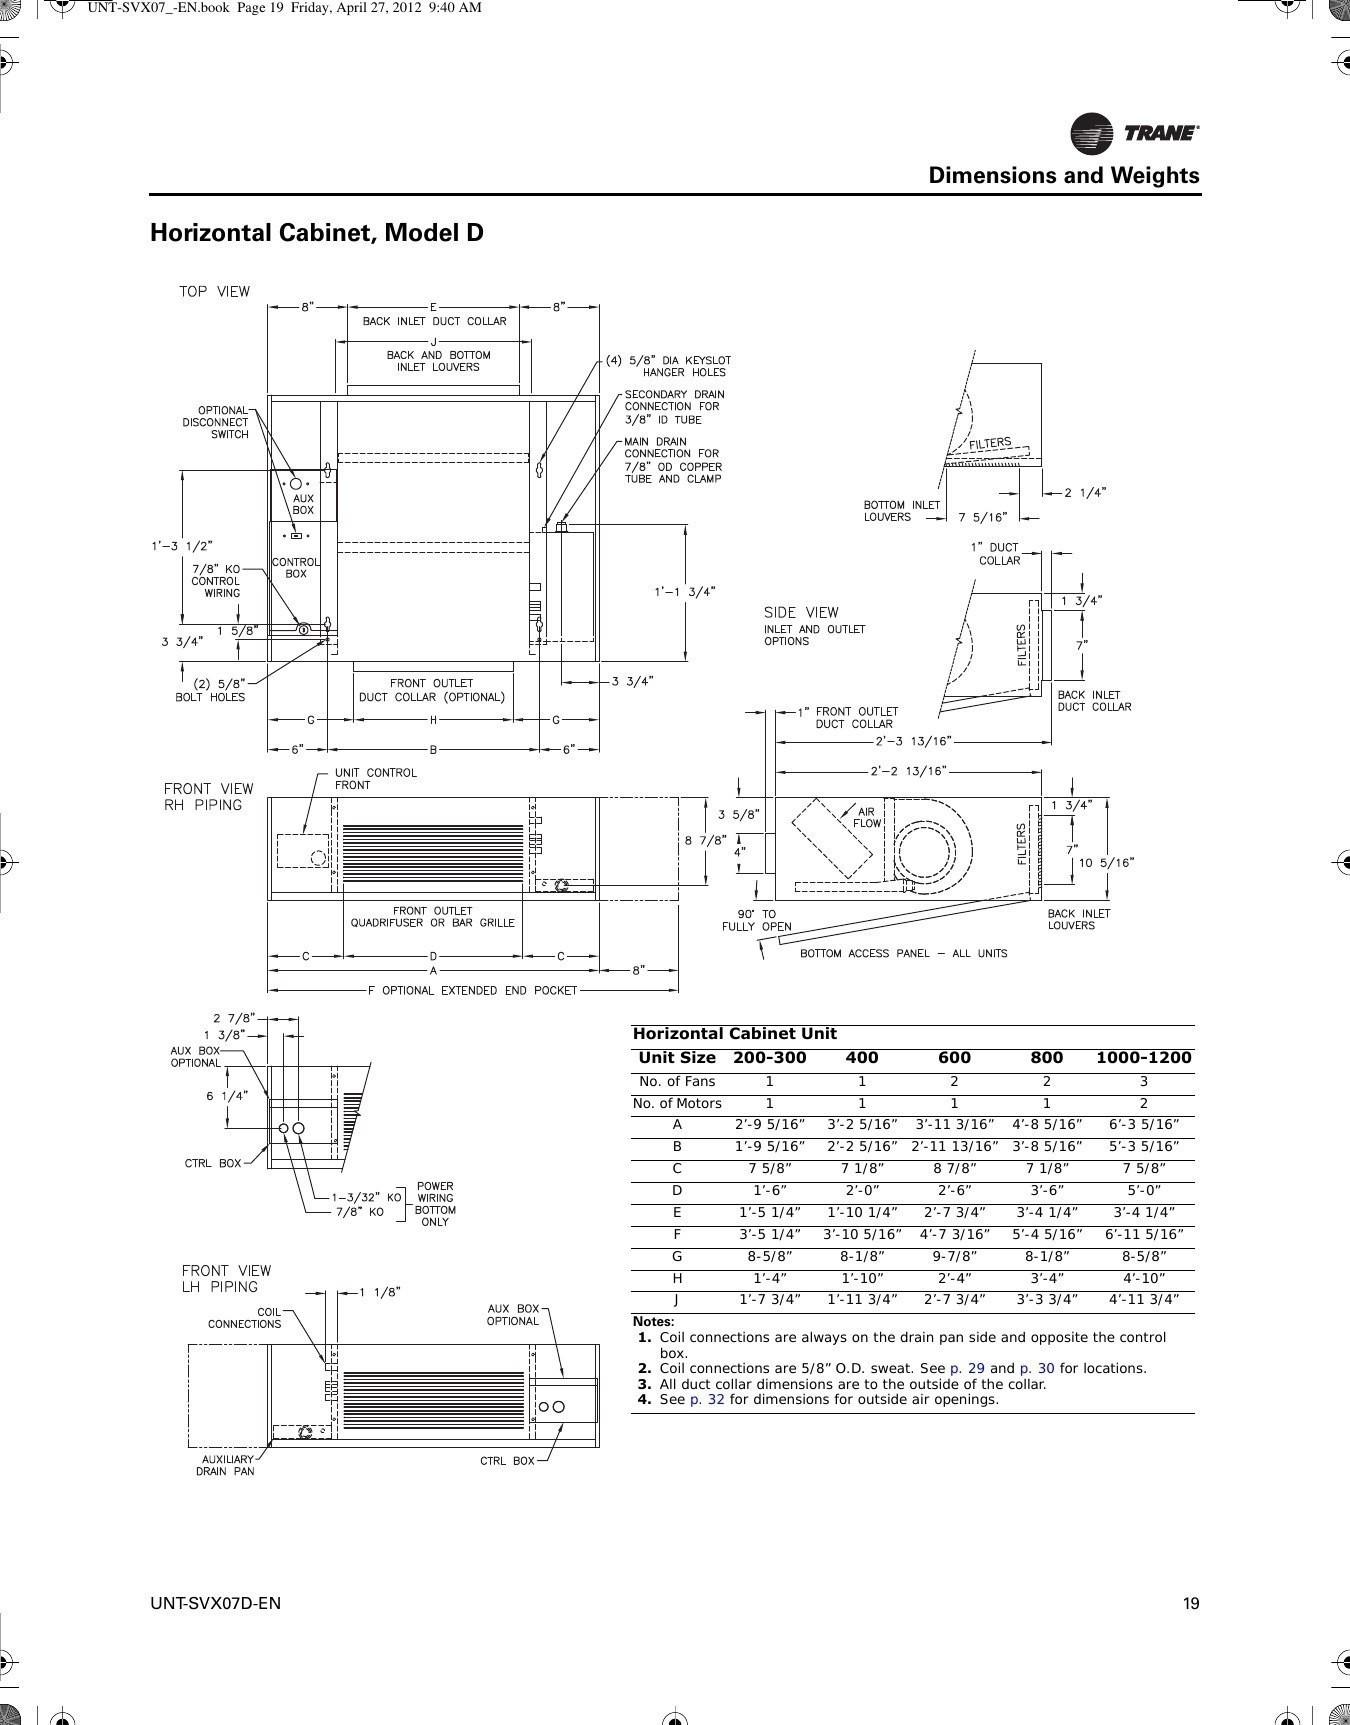 Electric Furnace Wiring Diagram Ge Gas Furnace Wiring ... on